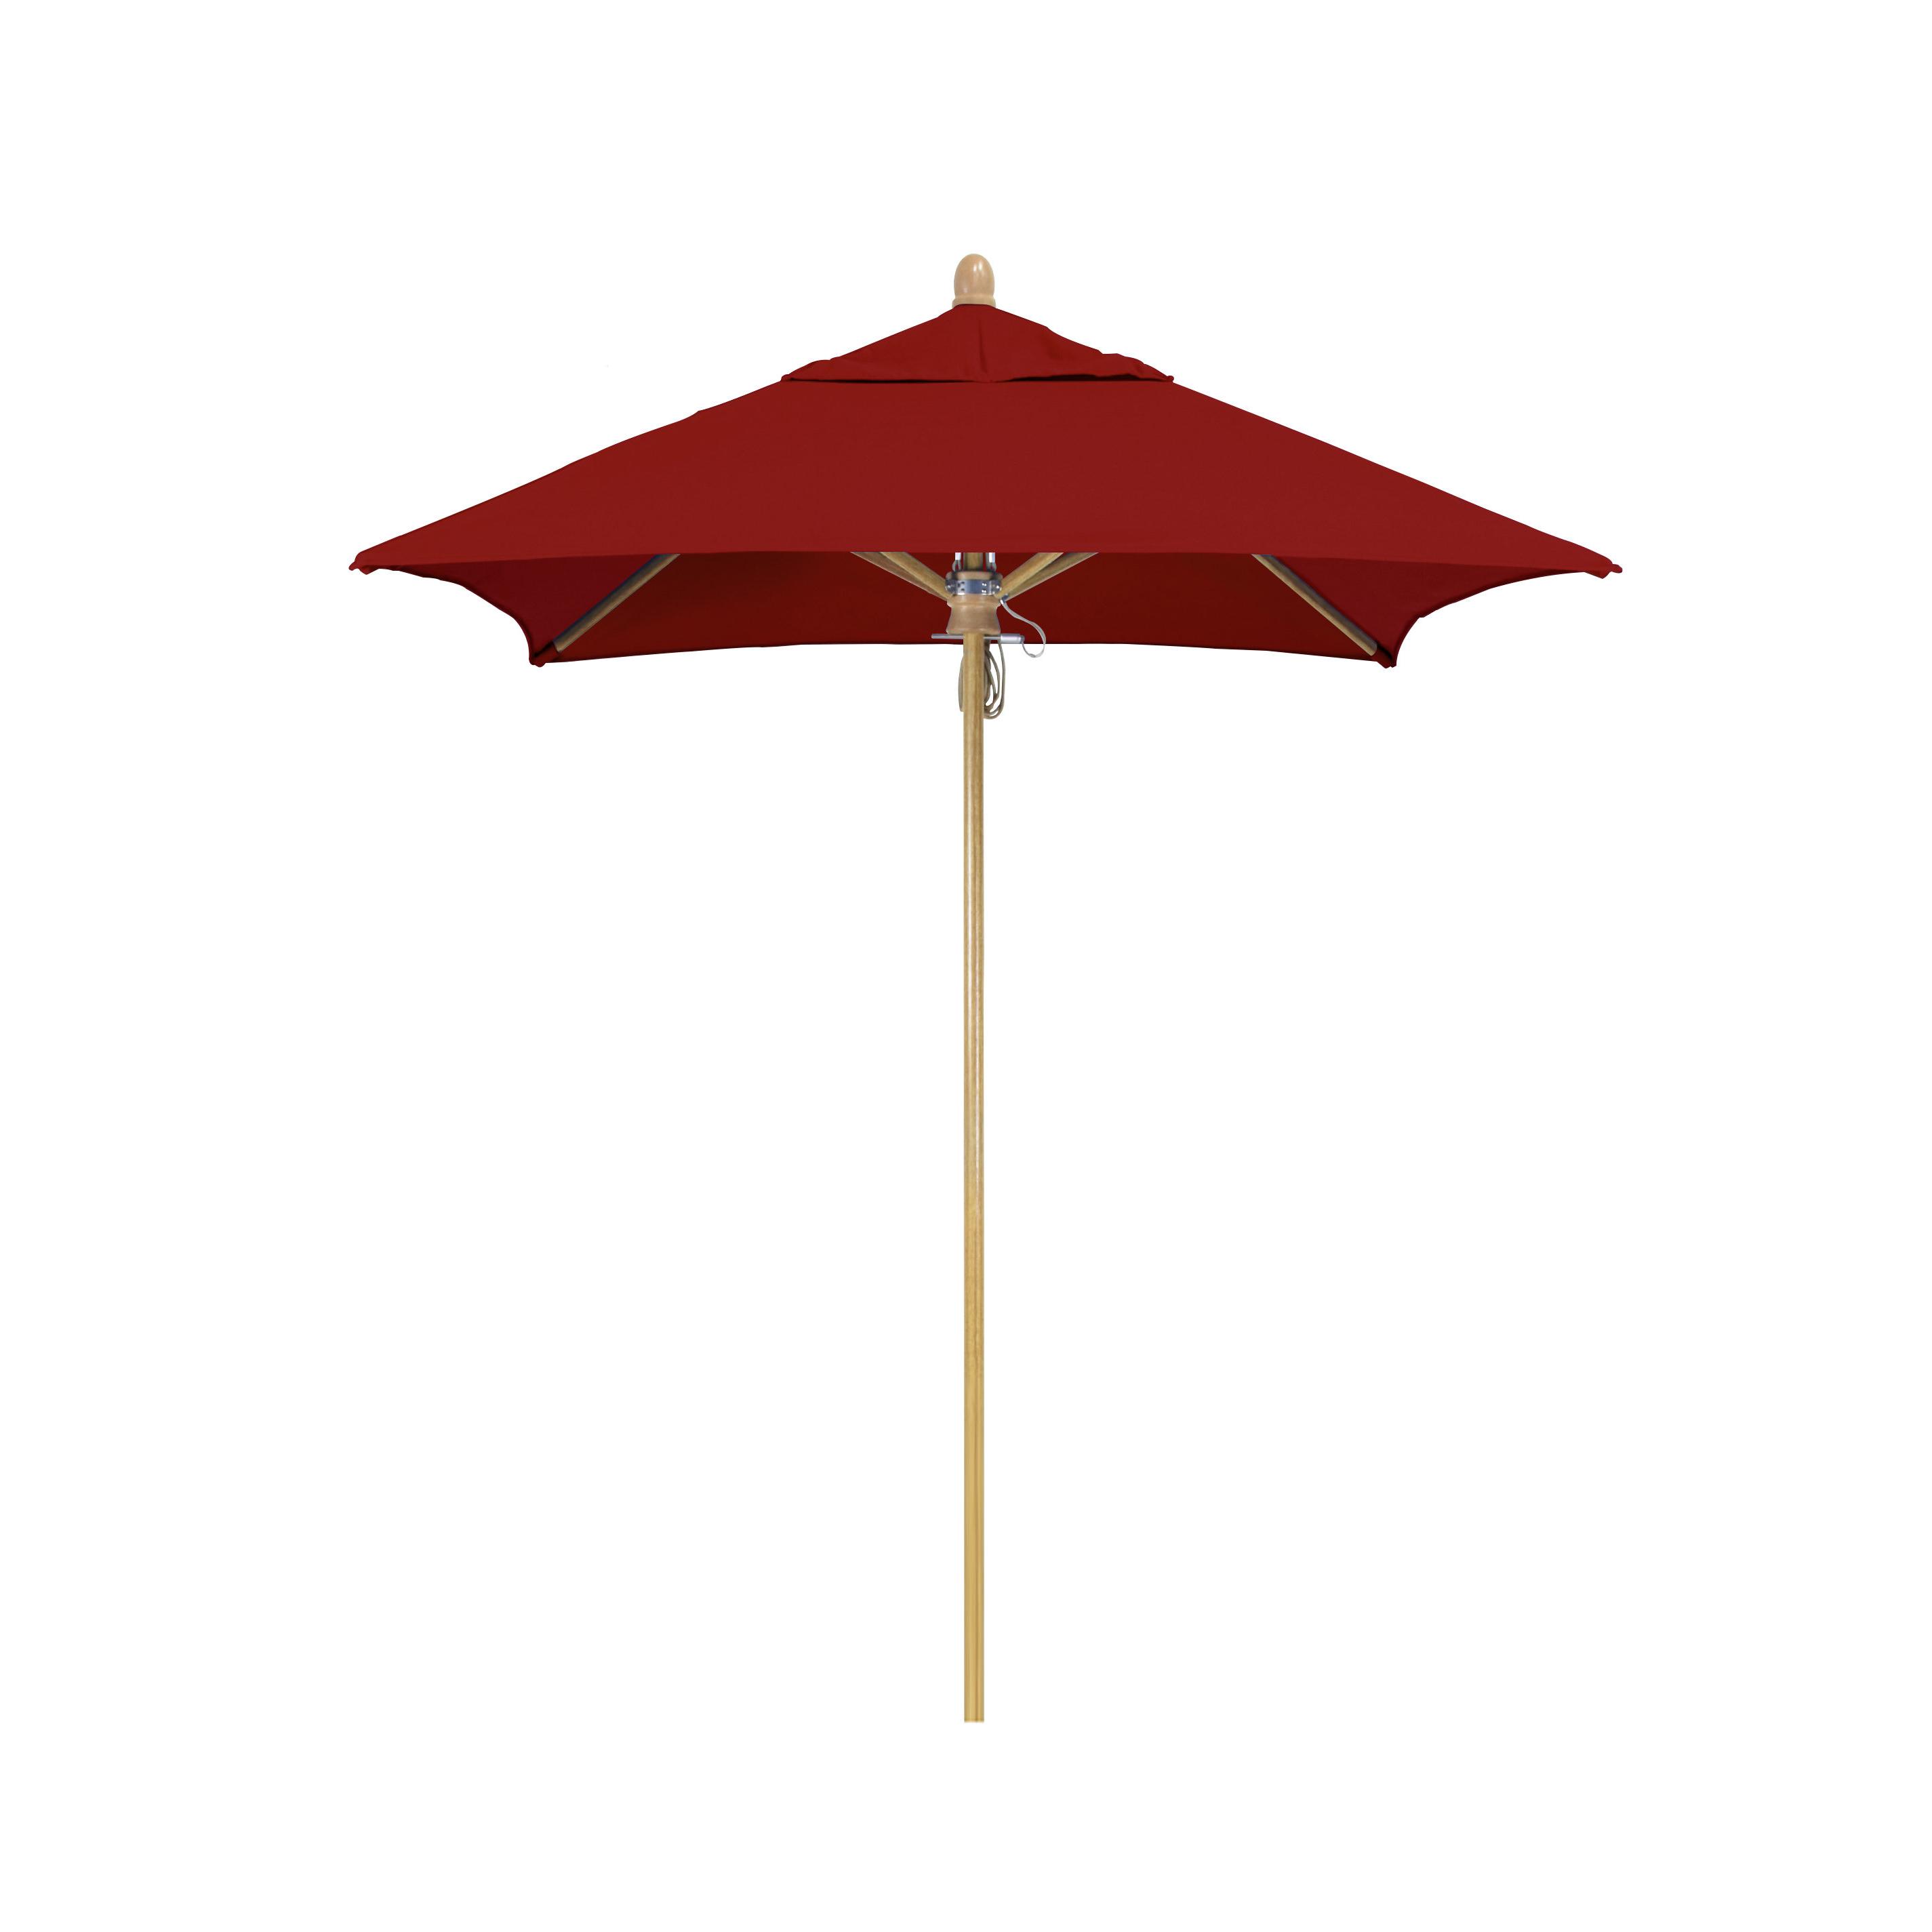 Sierra Series 6' Square Market Sunbrella Umbrella Within Most Recent Hyperion Market Umbrellas (View 18 of 20)